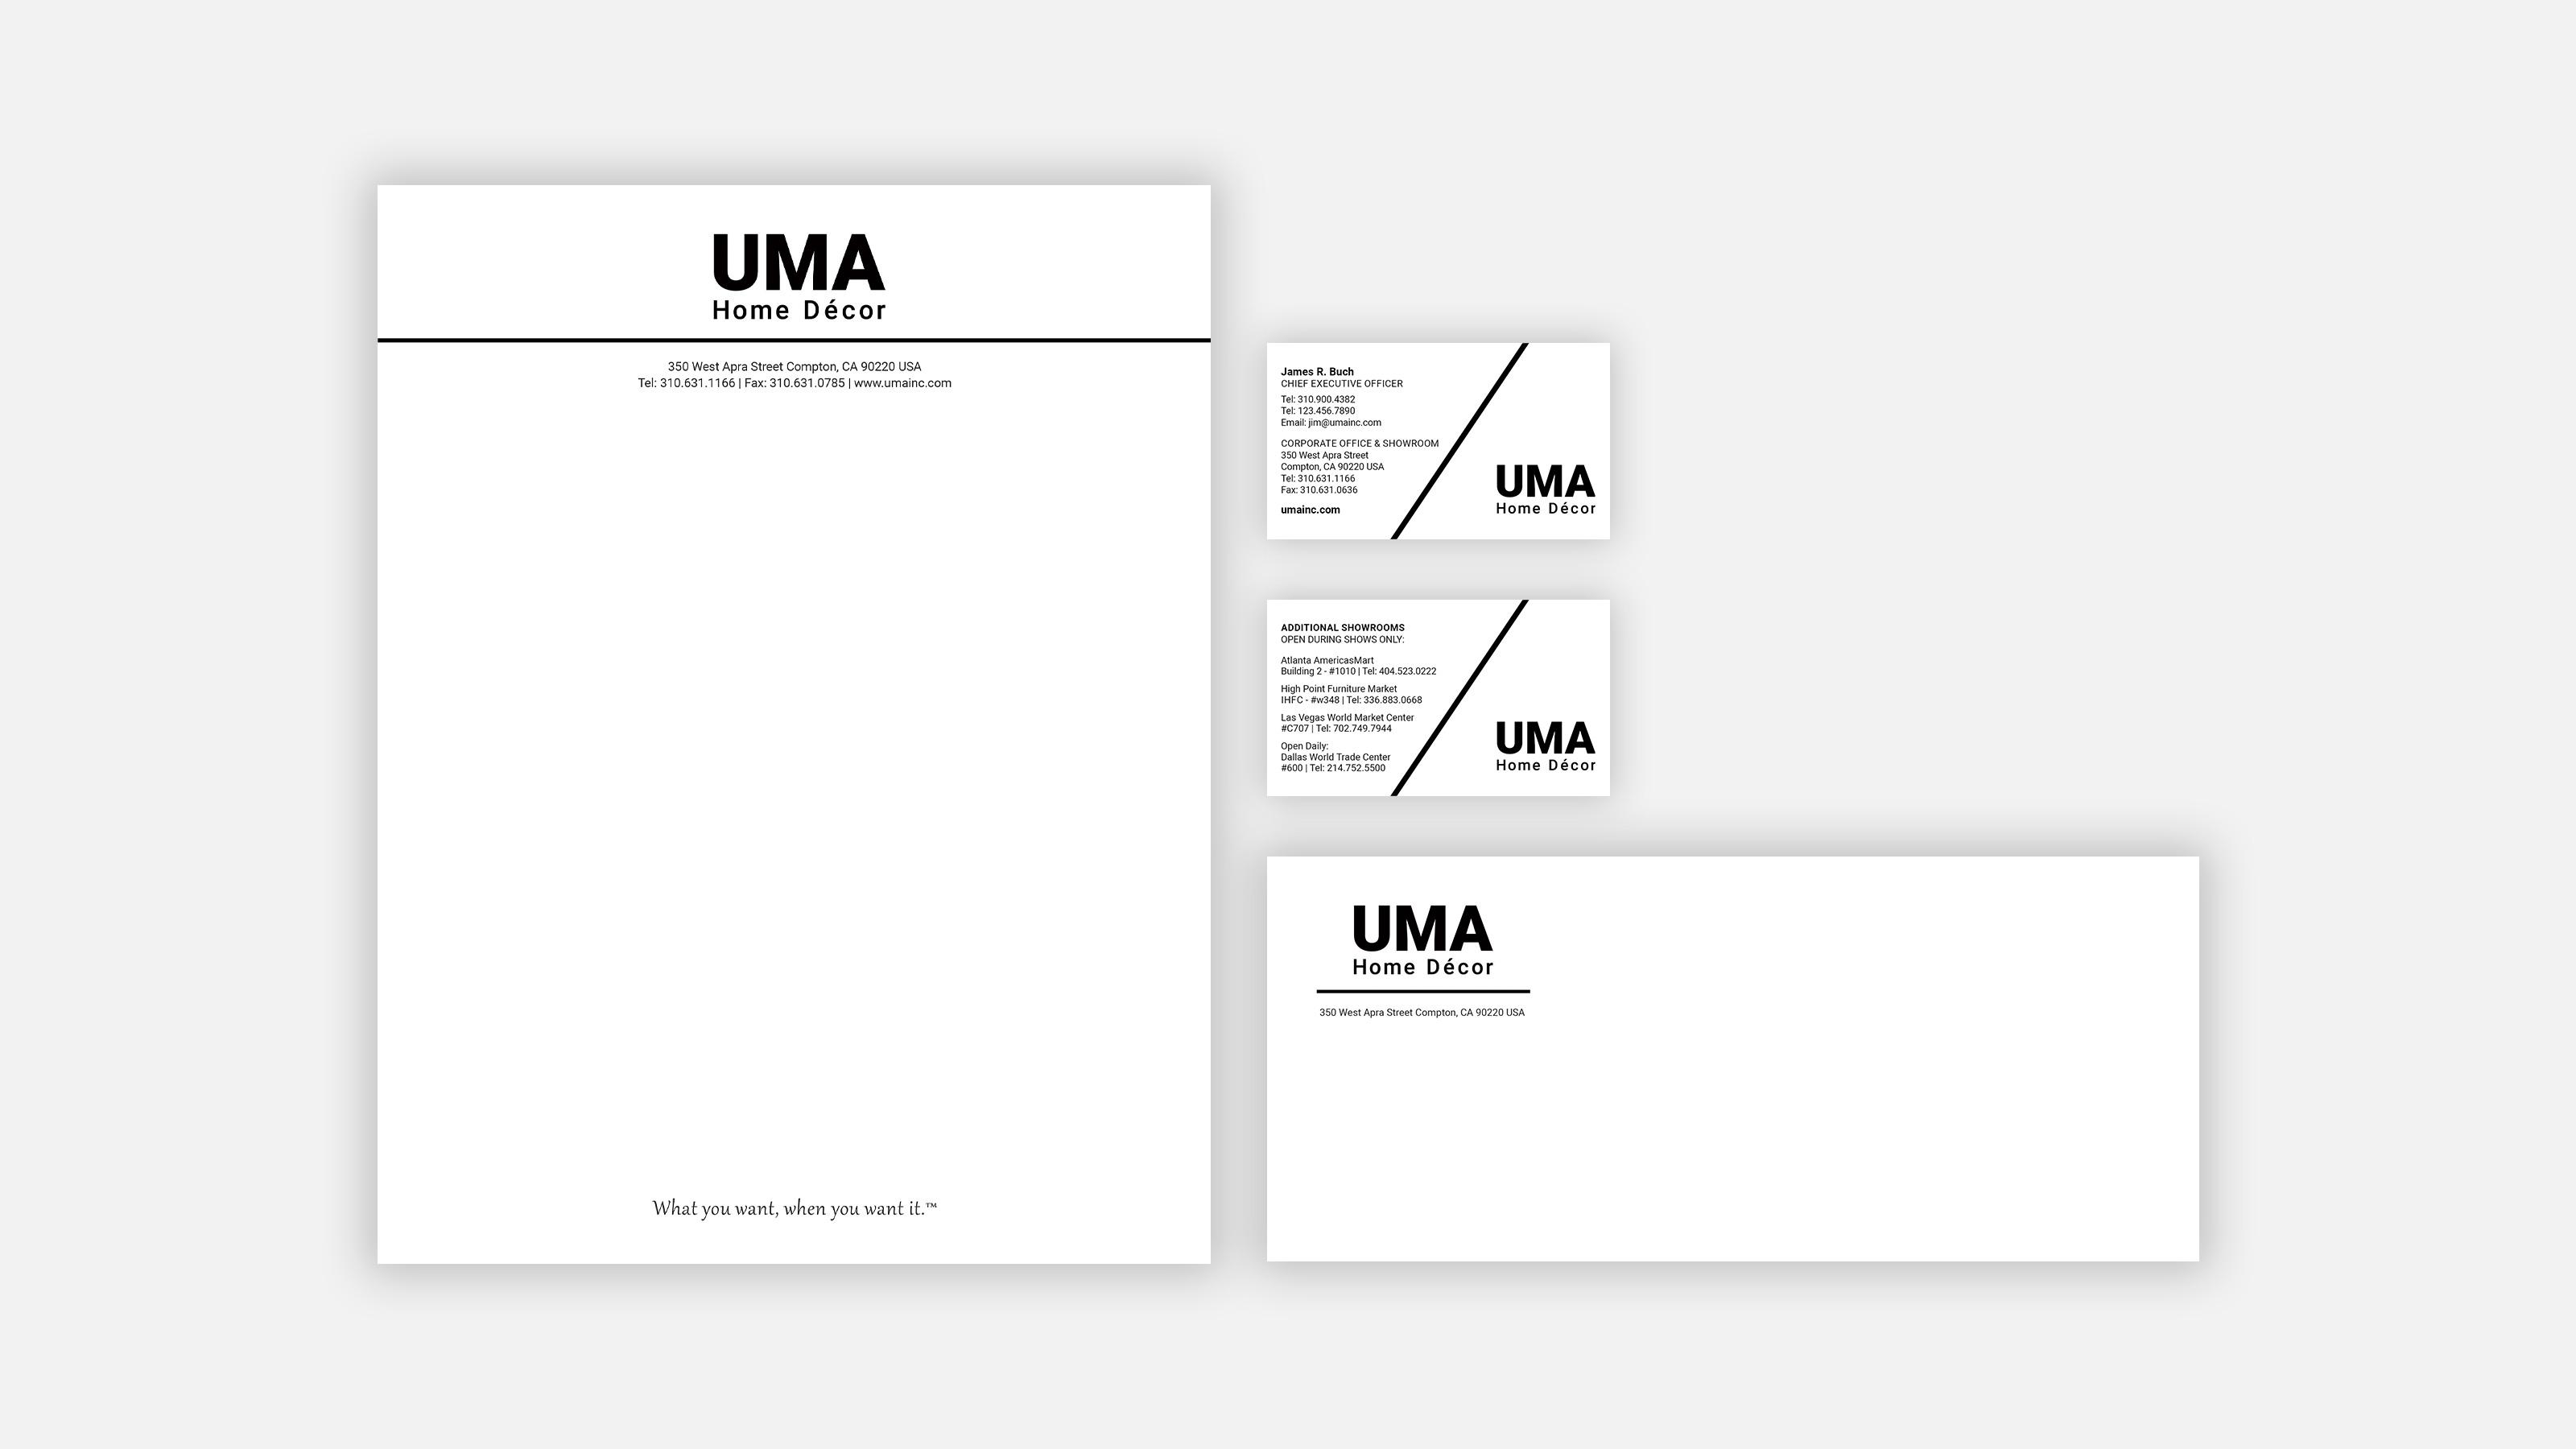 UMA Home Decor, business card, envelopes and letterhead samples